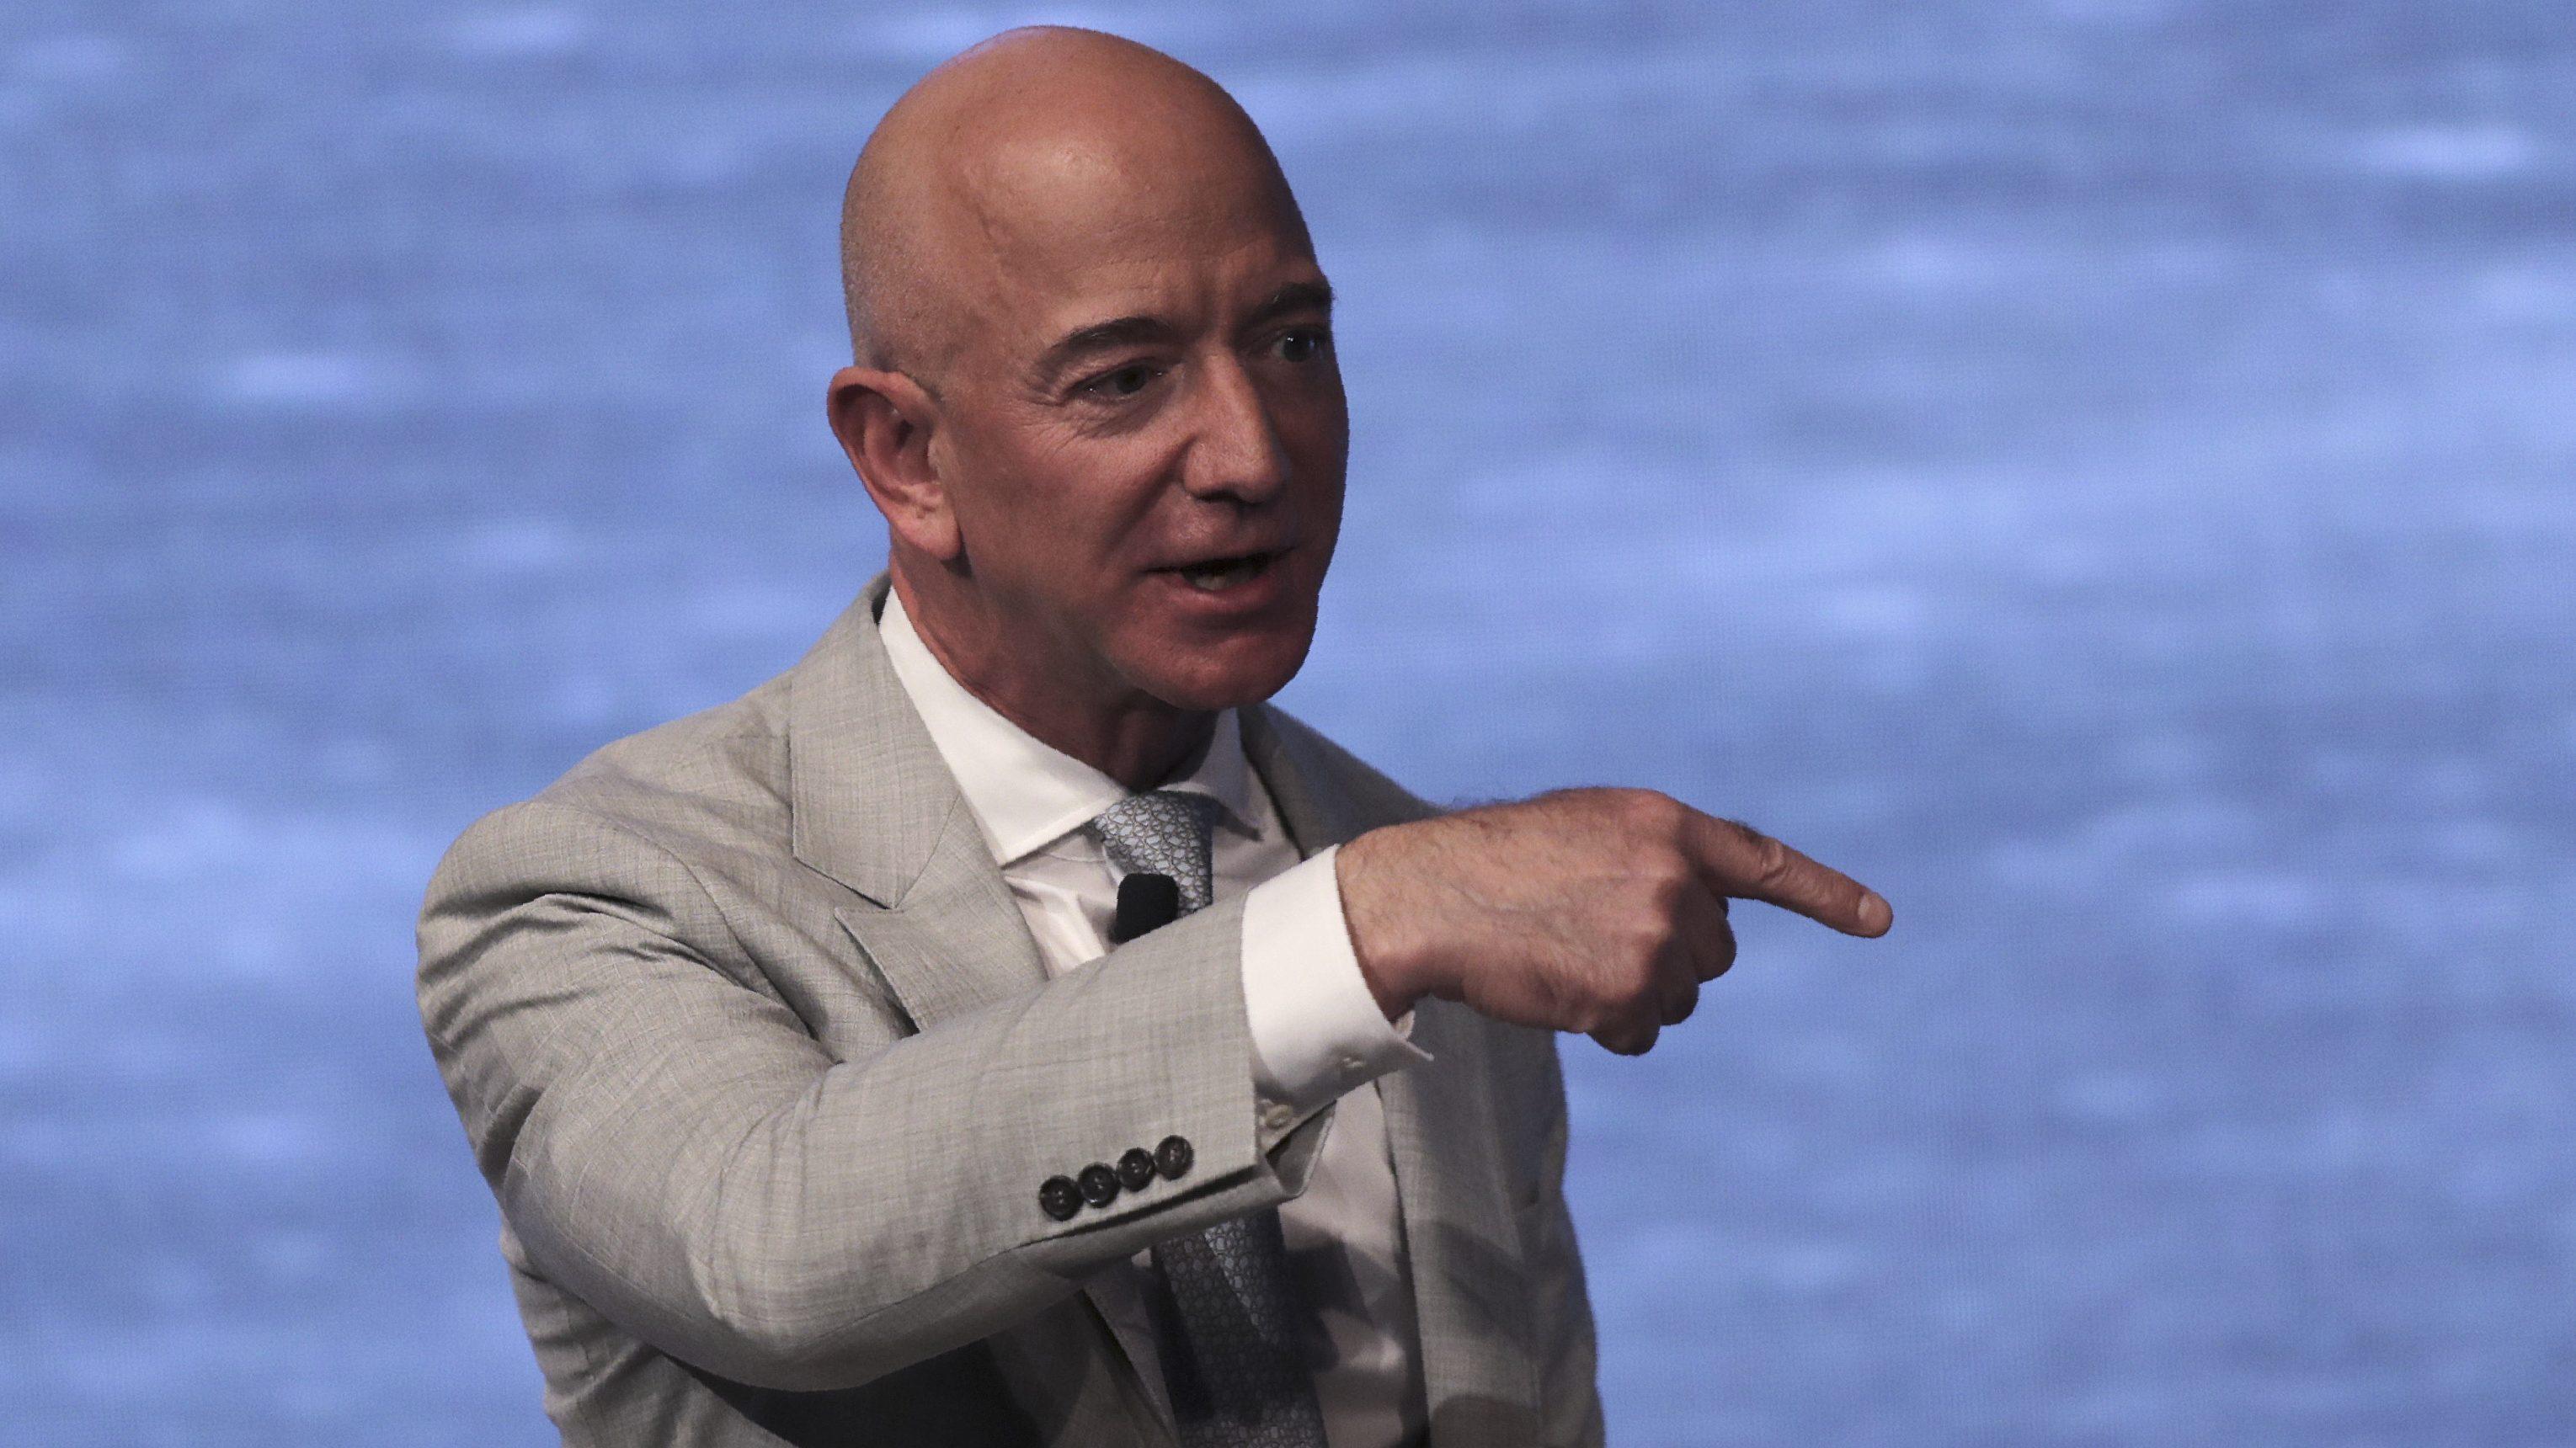 Climate change strikes: Can Jeff Bezos ignore an Amazon employee walkout?